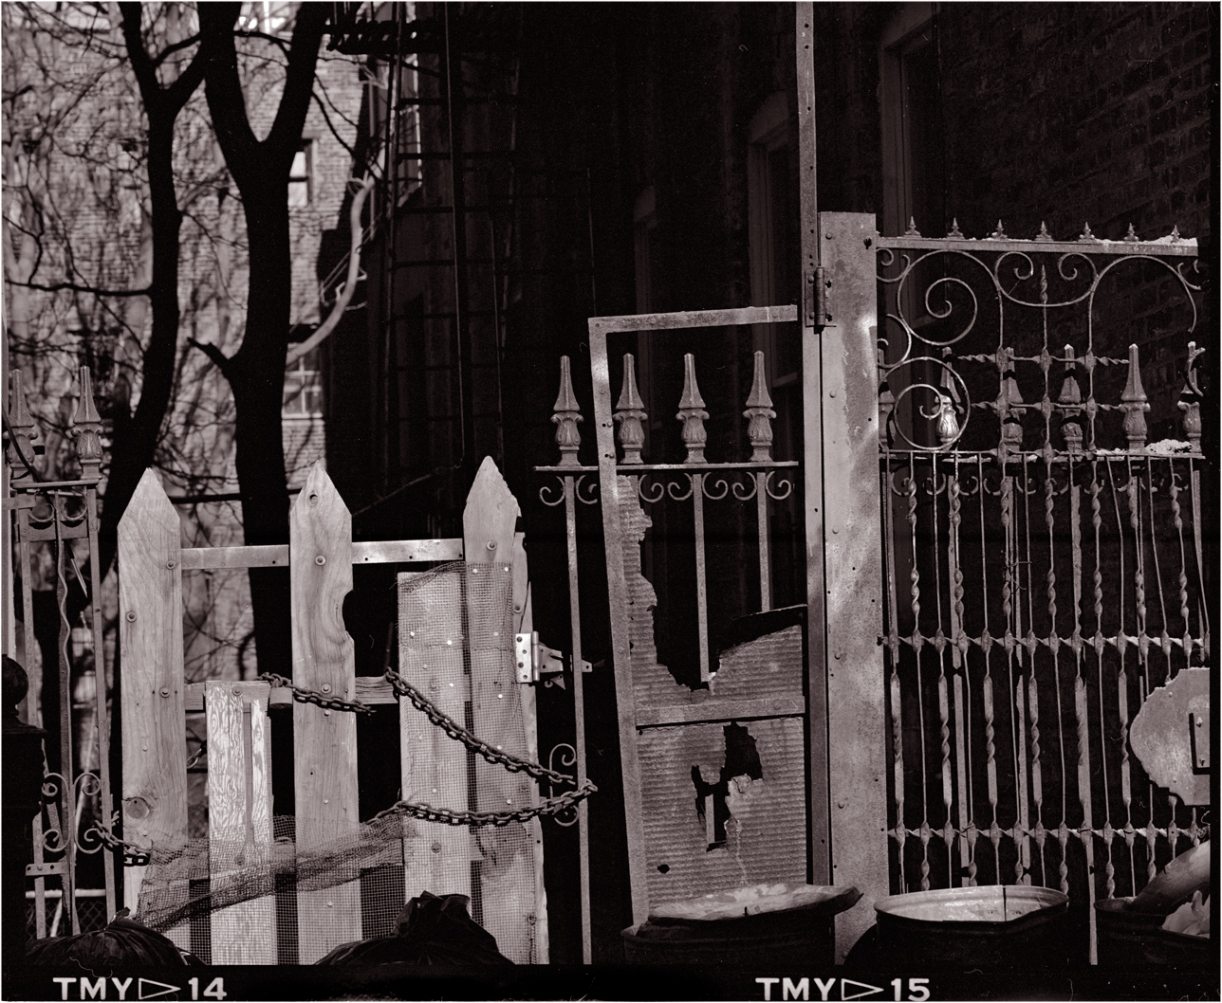 Harlem-Fences-gates-matt-weber